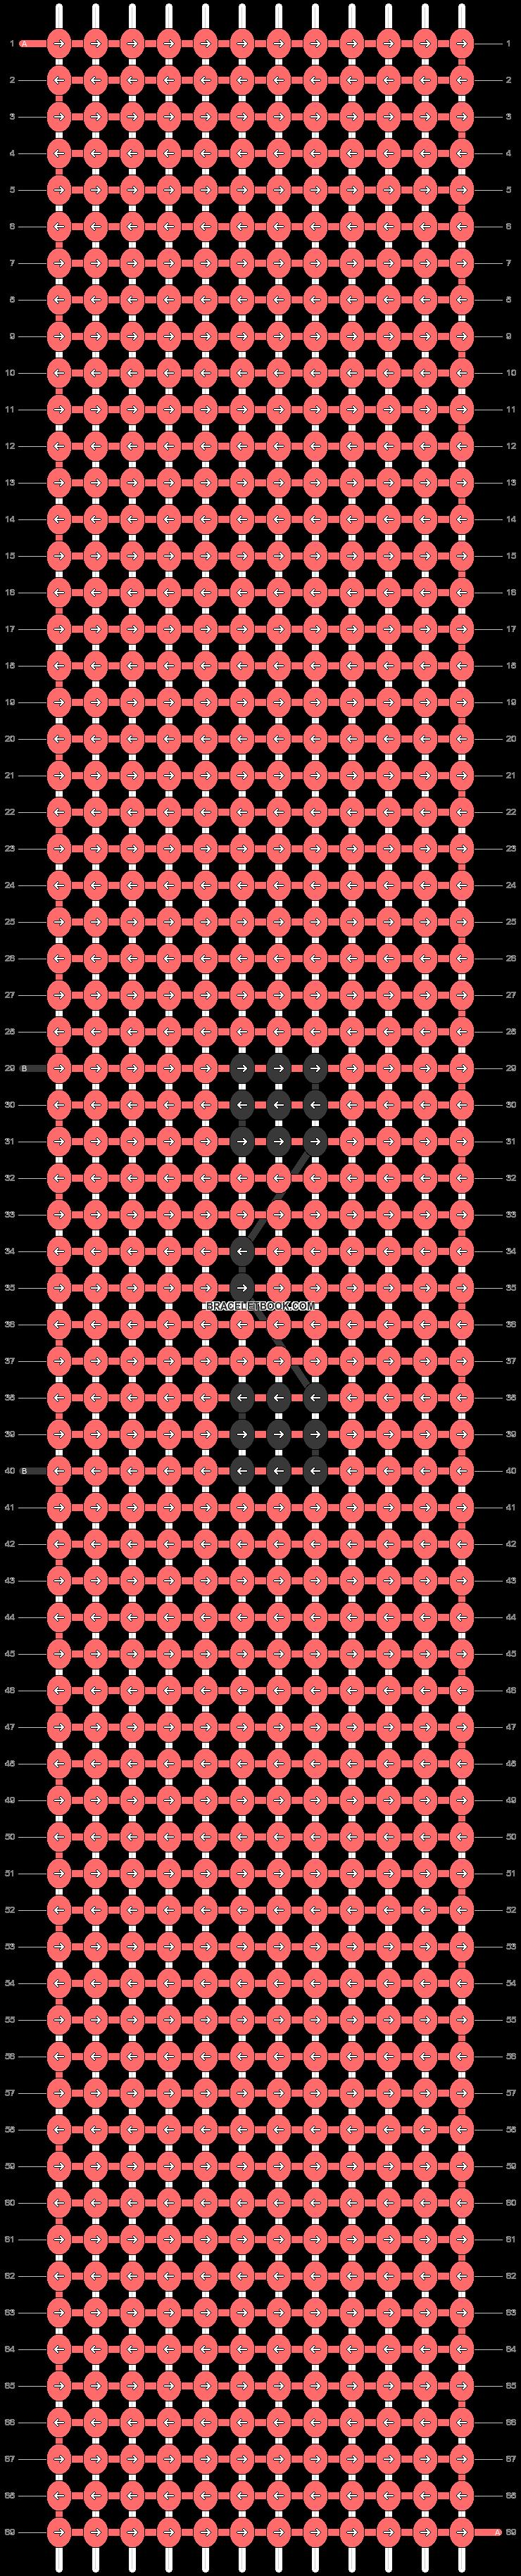 Alpha pattern #46015 pattern